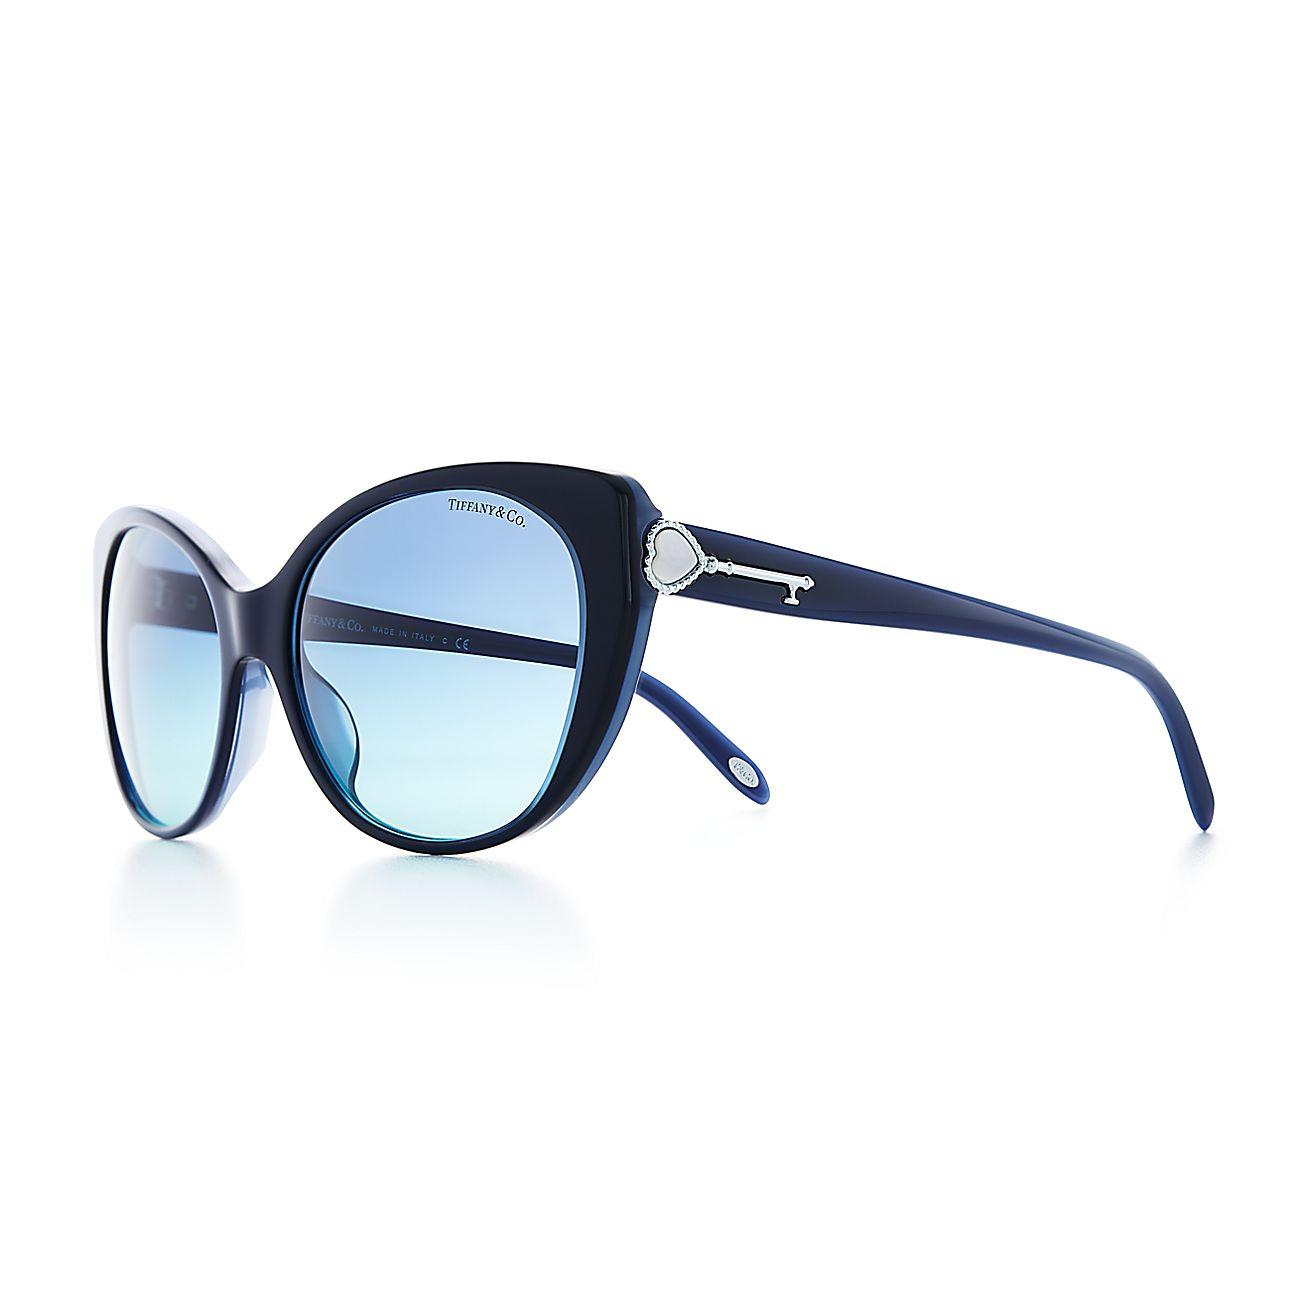 5ff2e3e274b0 Tiffany Glasses Frames Cat Eye